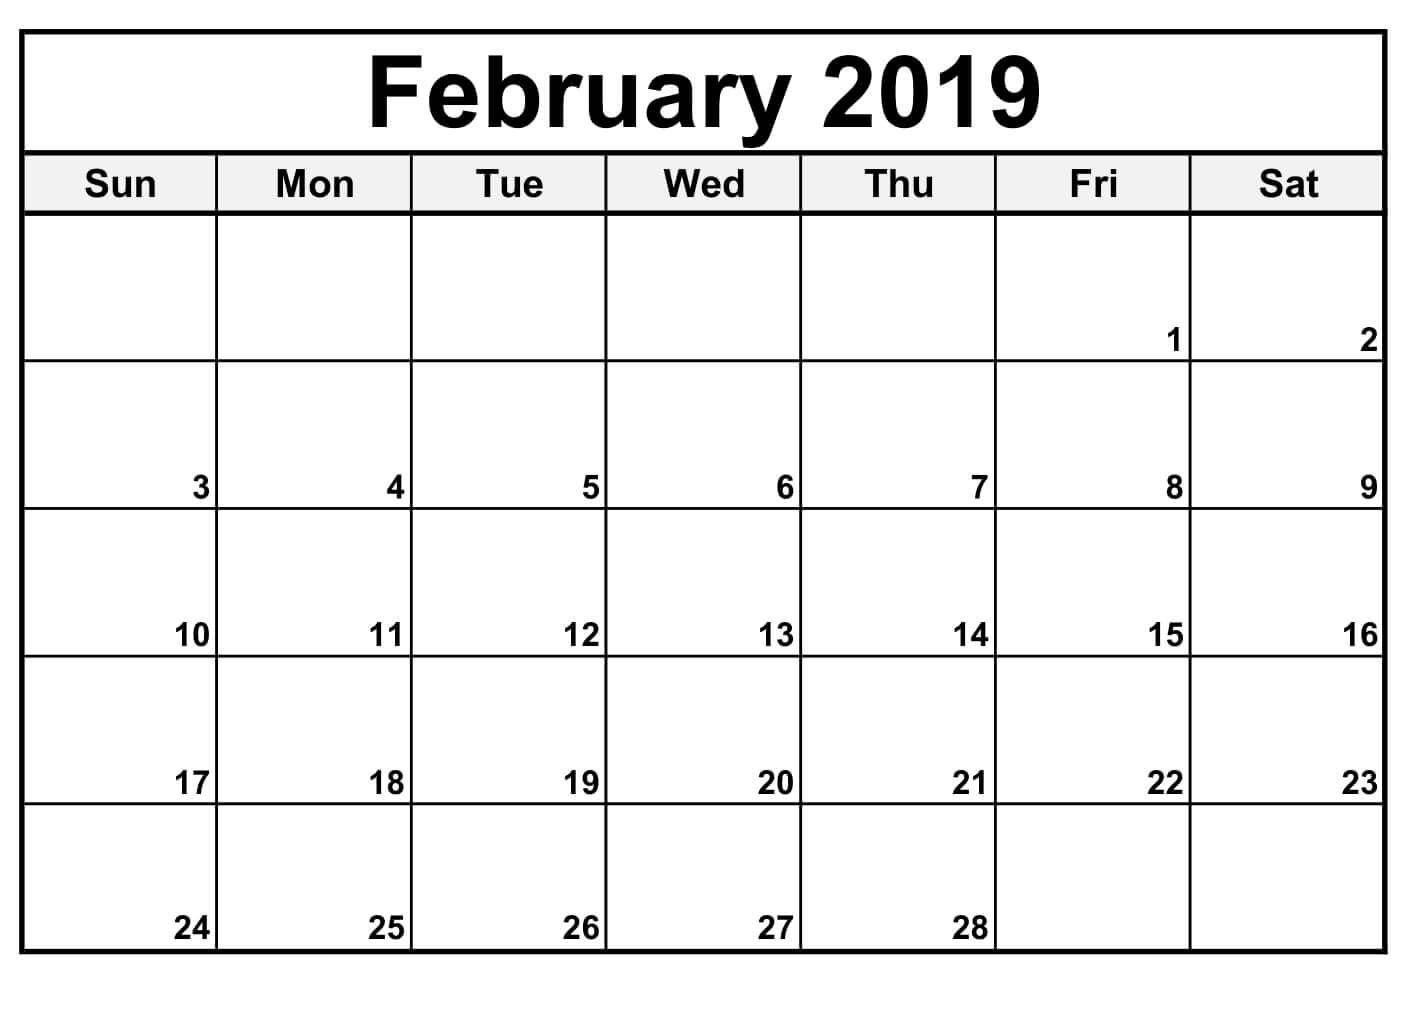 February 2019 Calendar Editable | Free Printable February 2019 within Free Printable Blank Calendars To Fill In